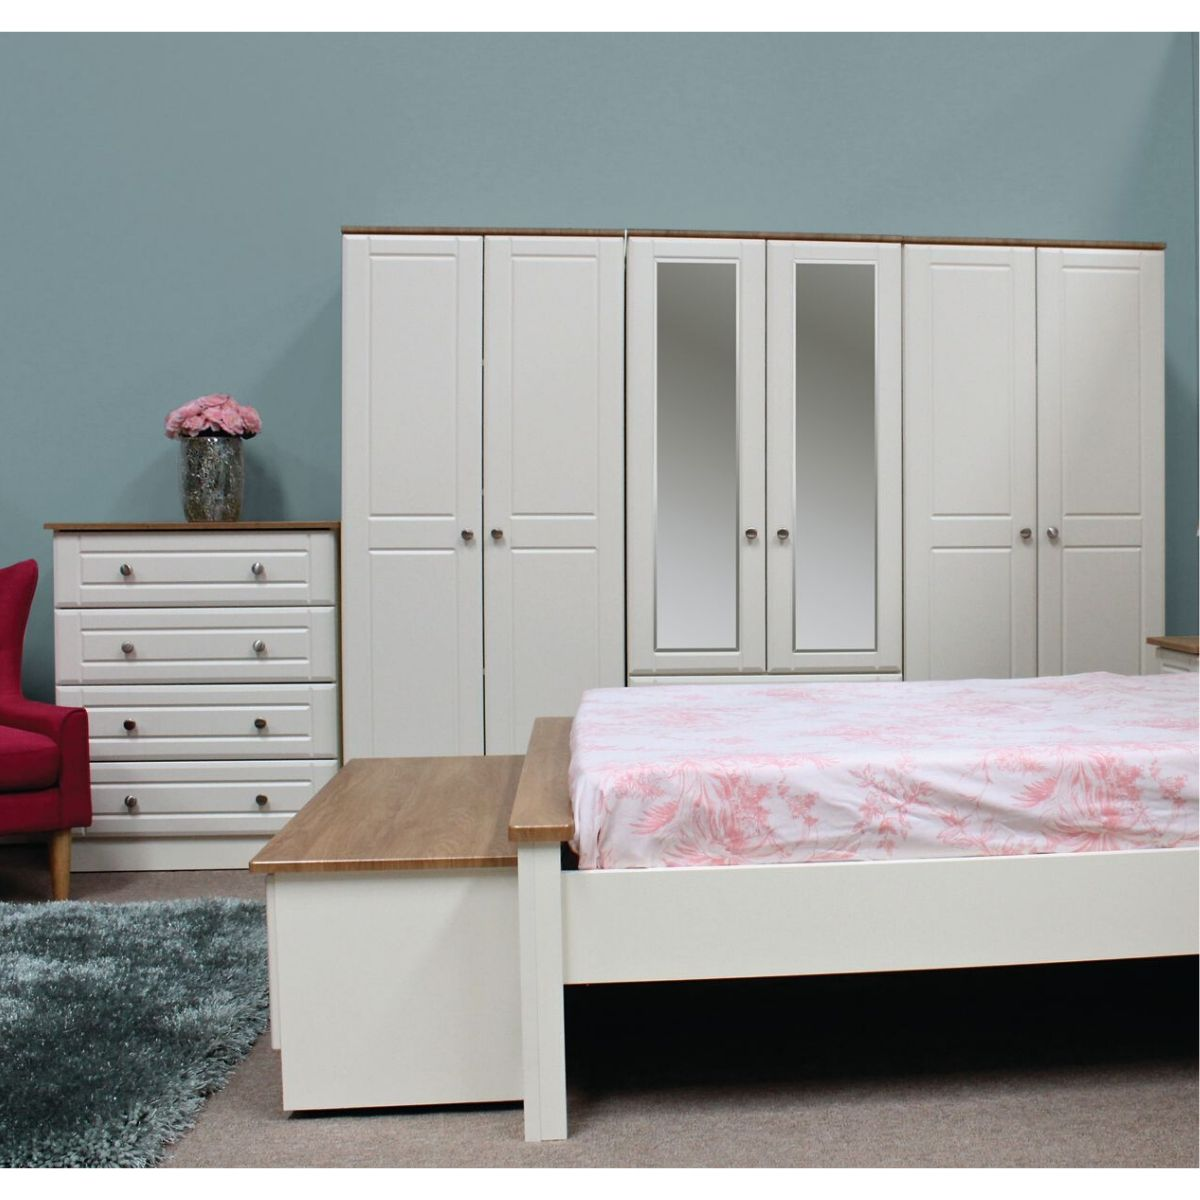 Erne Wardrobe Ivory & Oak - 19 Options